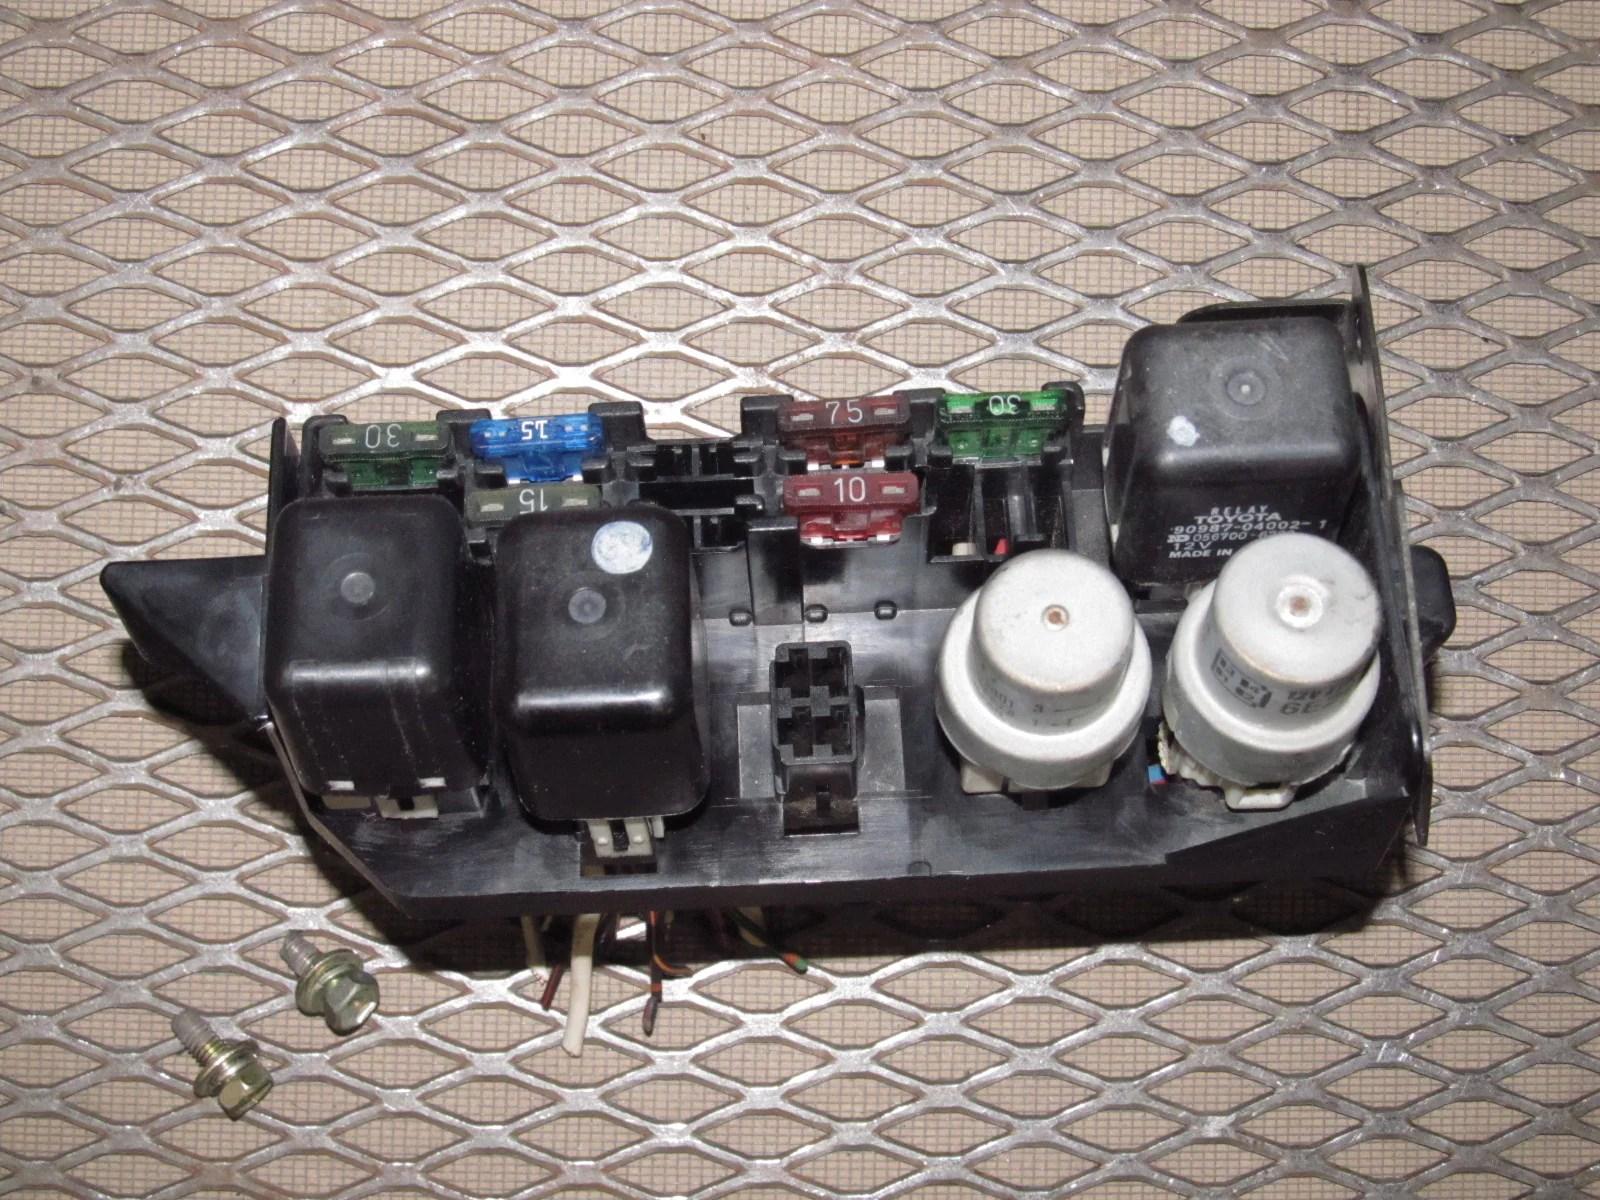 medium resolution of mr2 fuse box wiring diagram g985 mr2 fuse box wiring library diagram experts vehicle fuse box